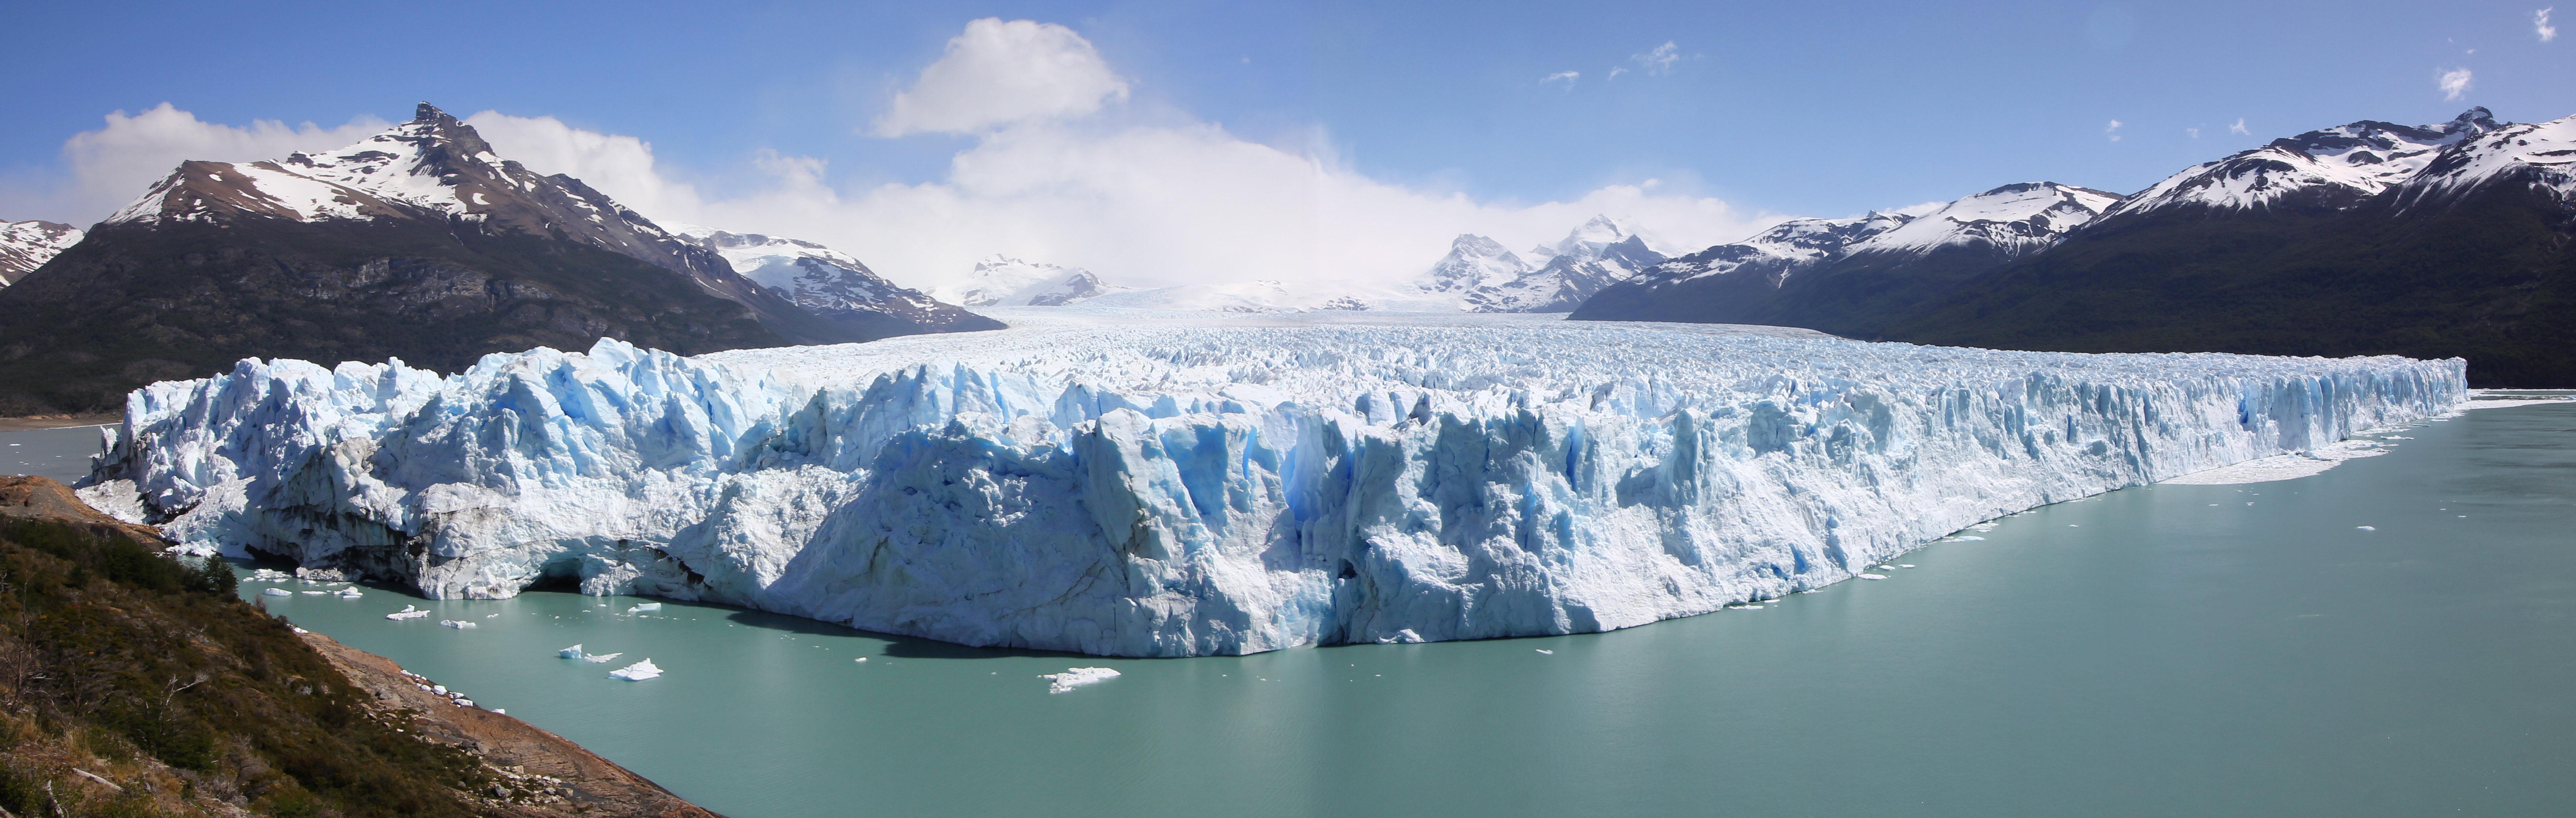 A panorama of the 5 kilometre-wide, 60 metre-high front face of the Perito Moreno Glacier in Lago Argentino, Parque Nacional Los Glaciares, Patagonia, Argentina. November 2, 2015.